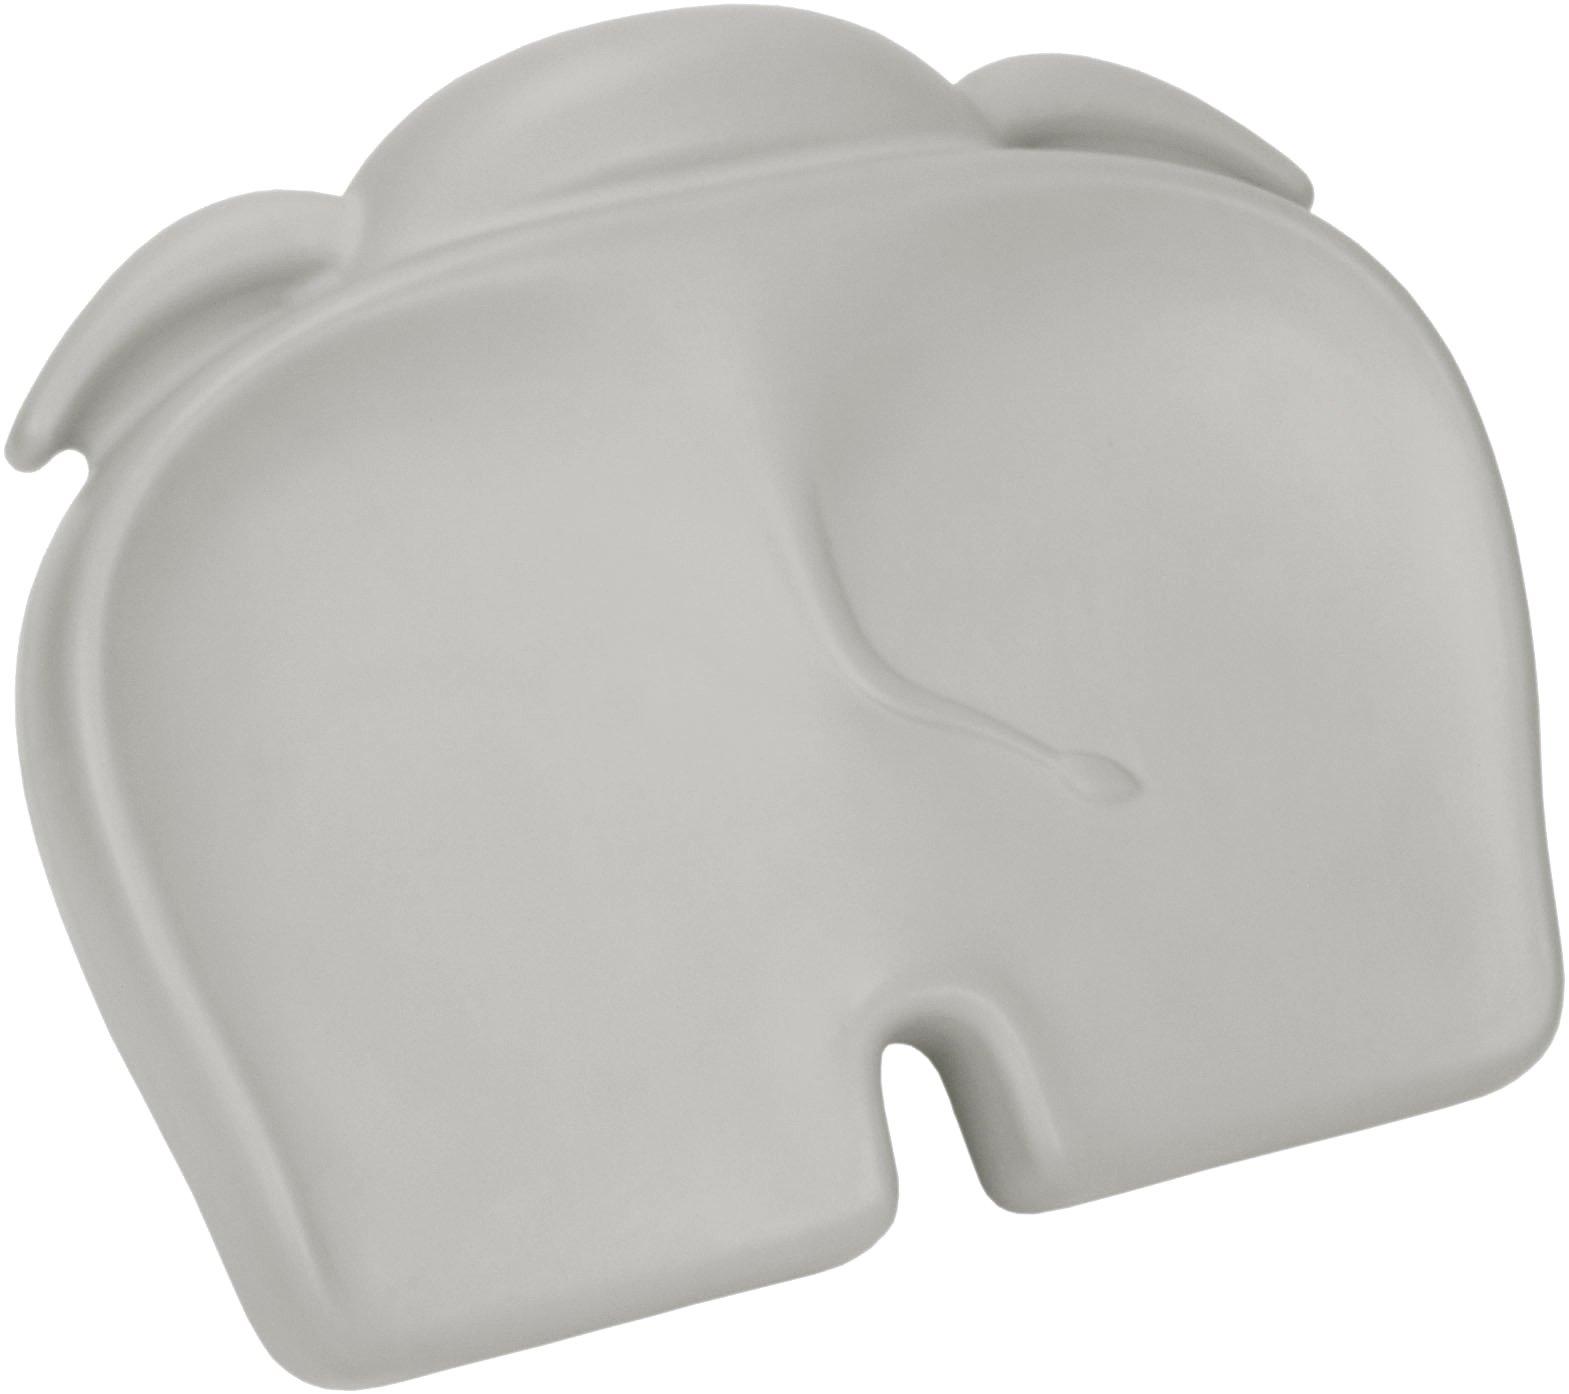 Bumbo Elipad, Toddler Floor Seat and Kneeling Pad - Cool Grey